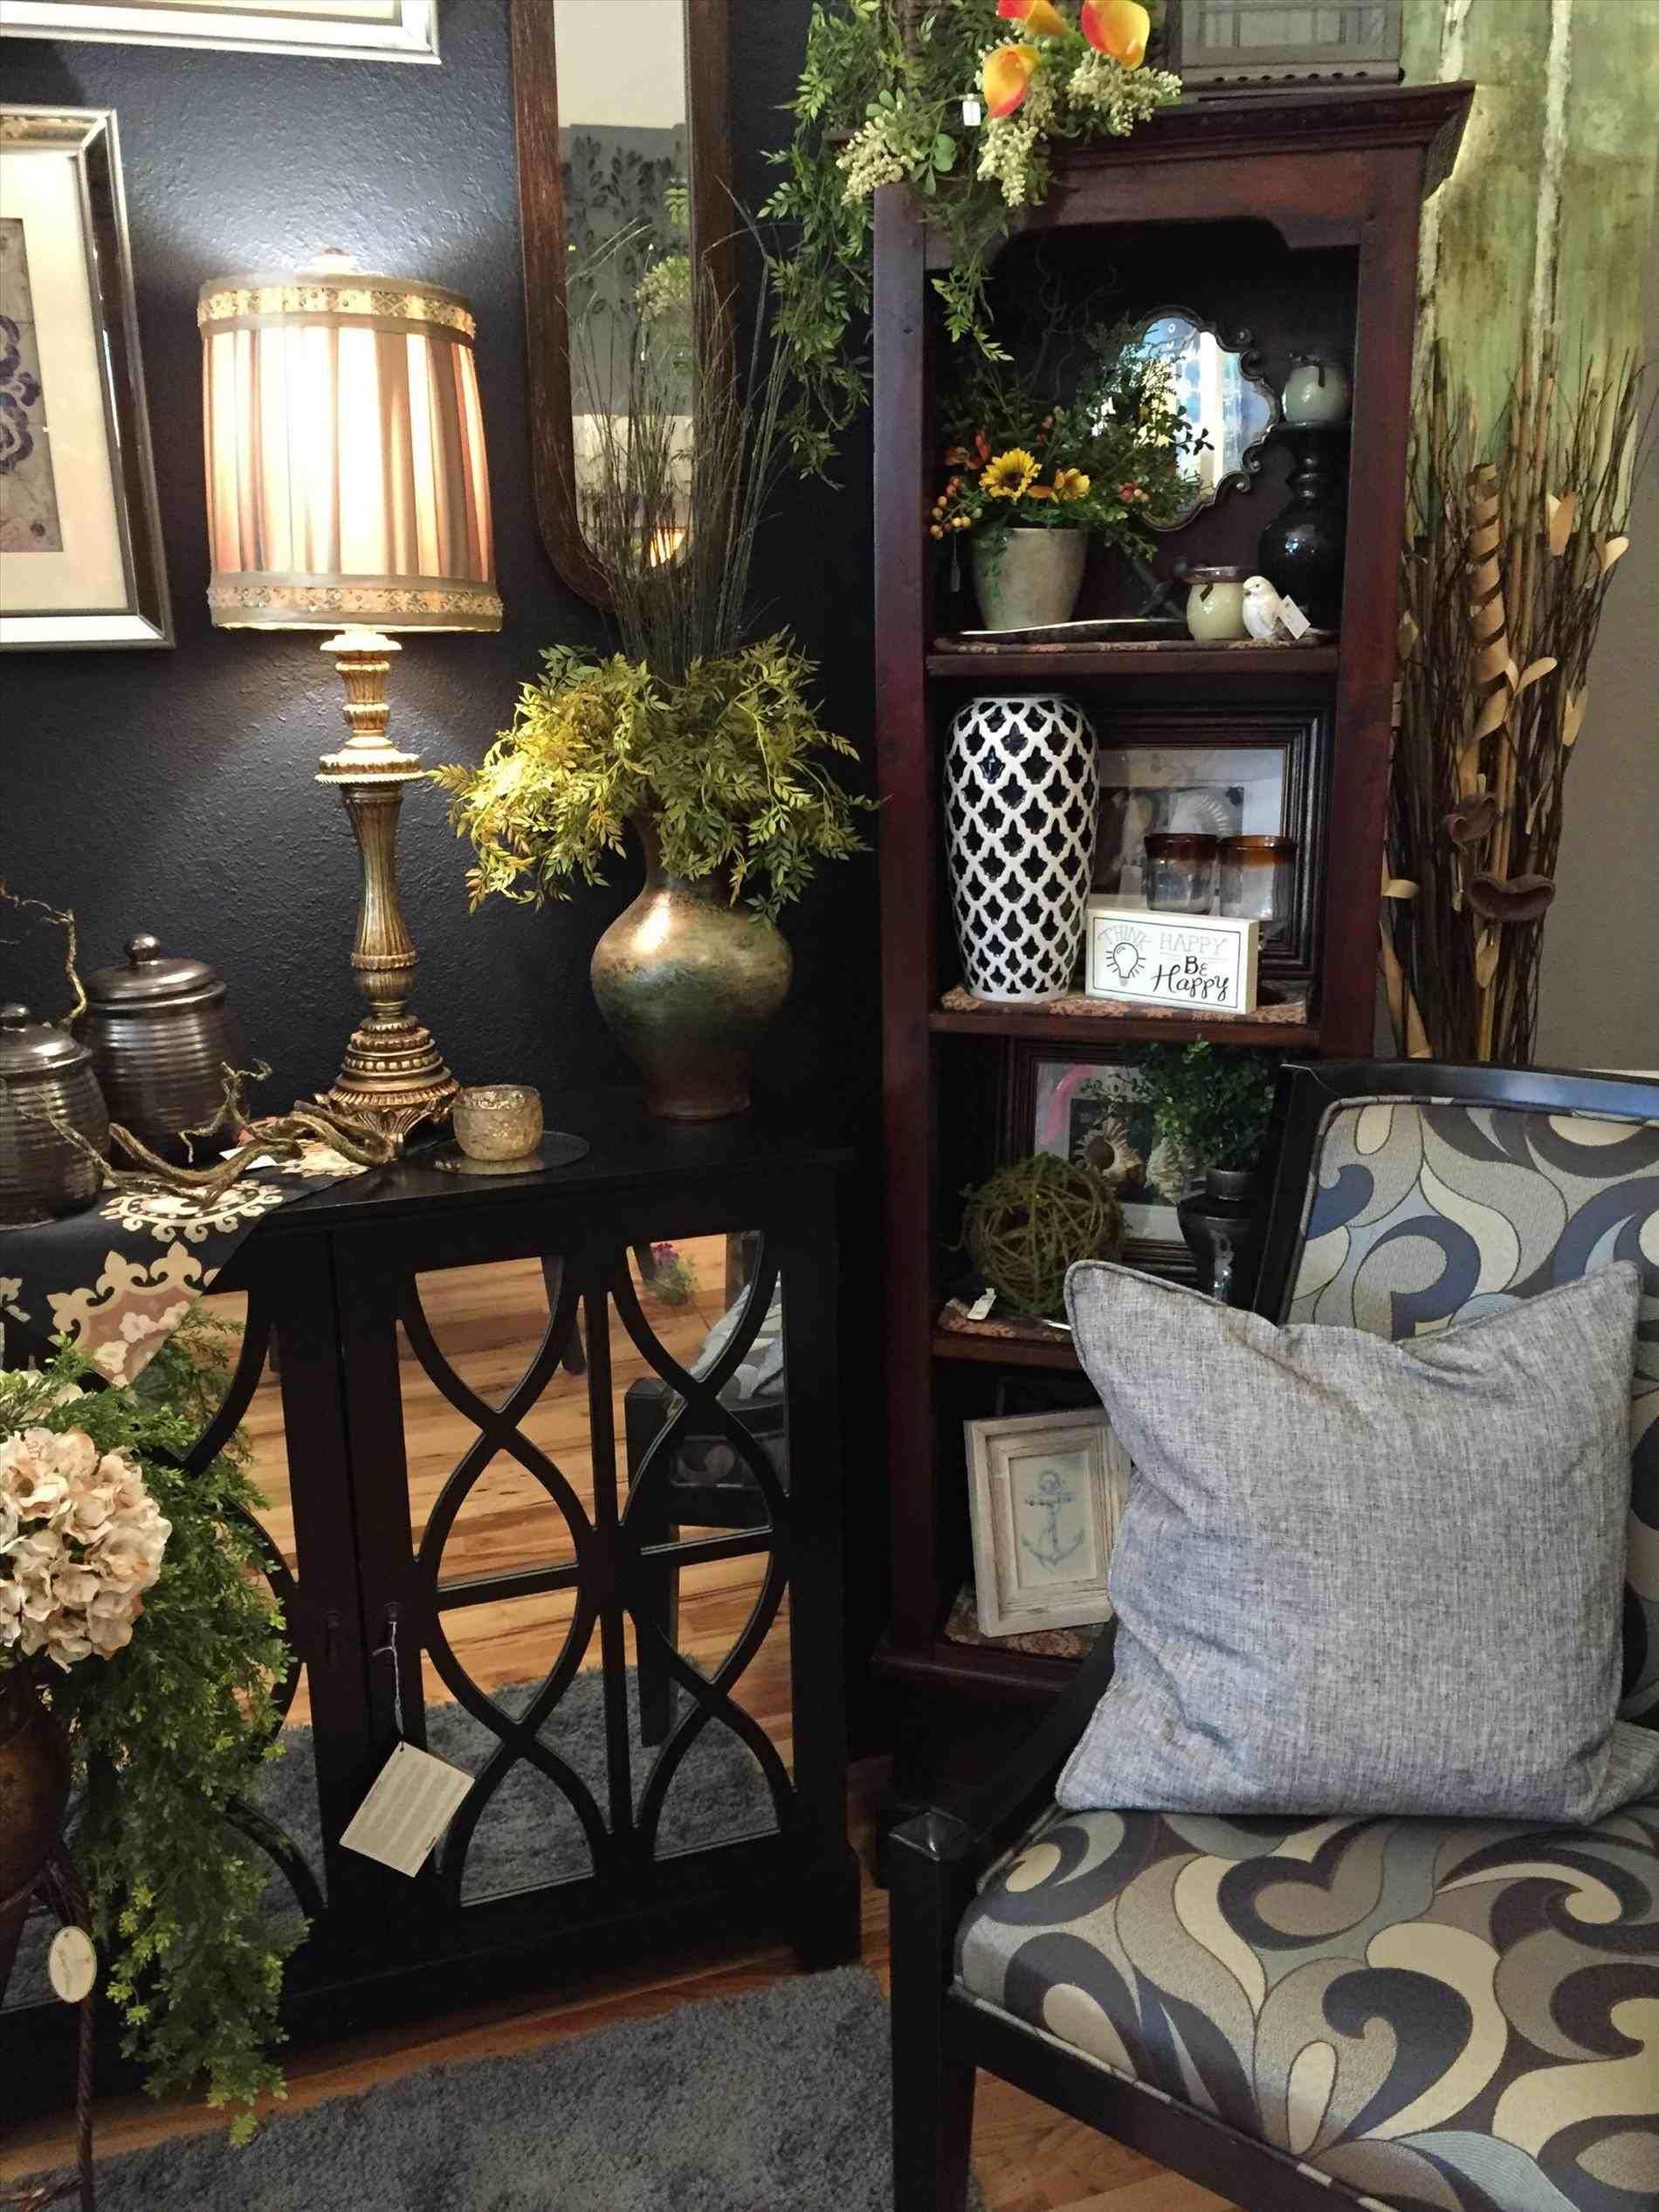 Master bedroom designs as per vastu  famous interior designers at work  Pinterest  Famous interior